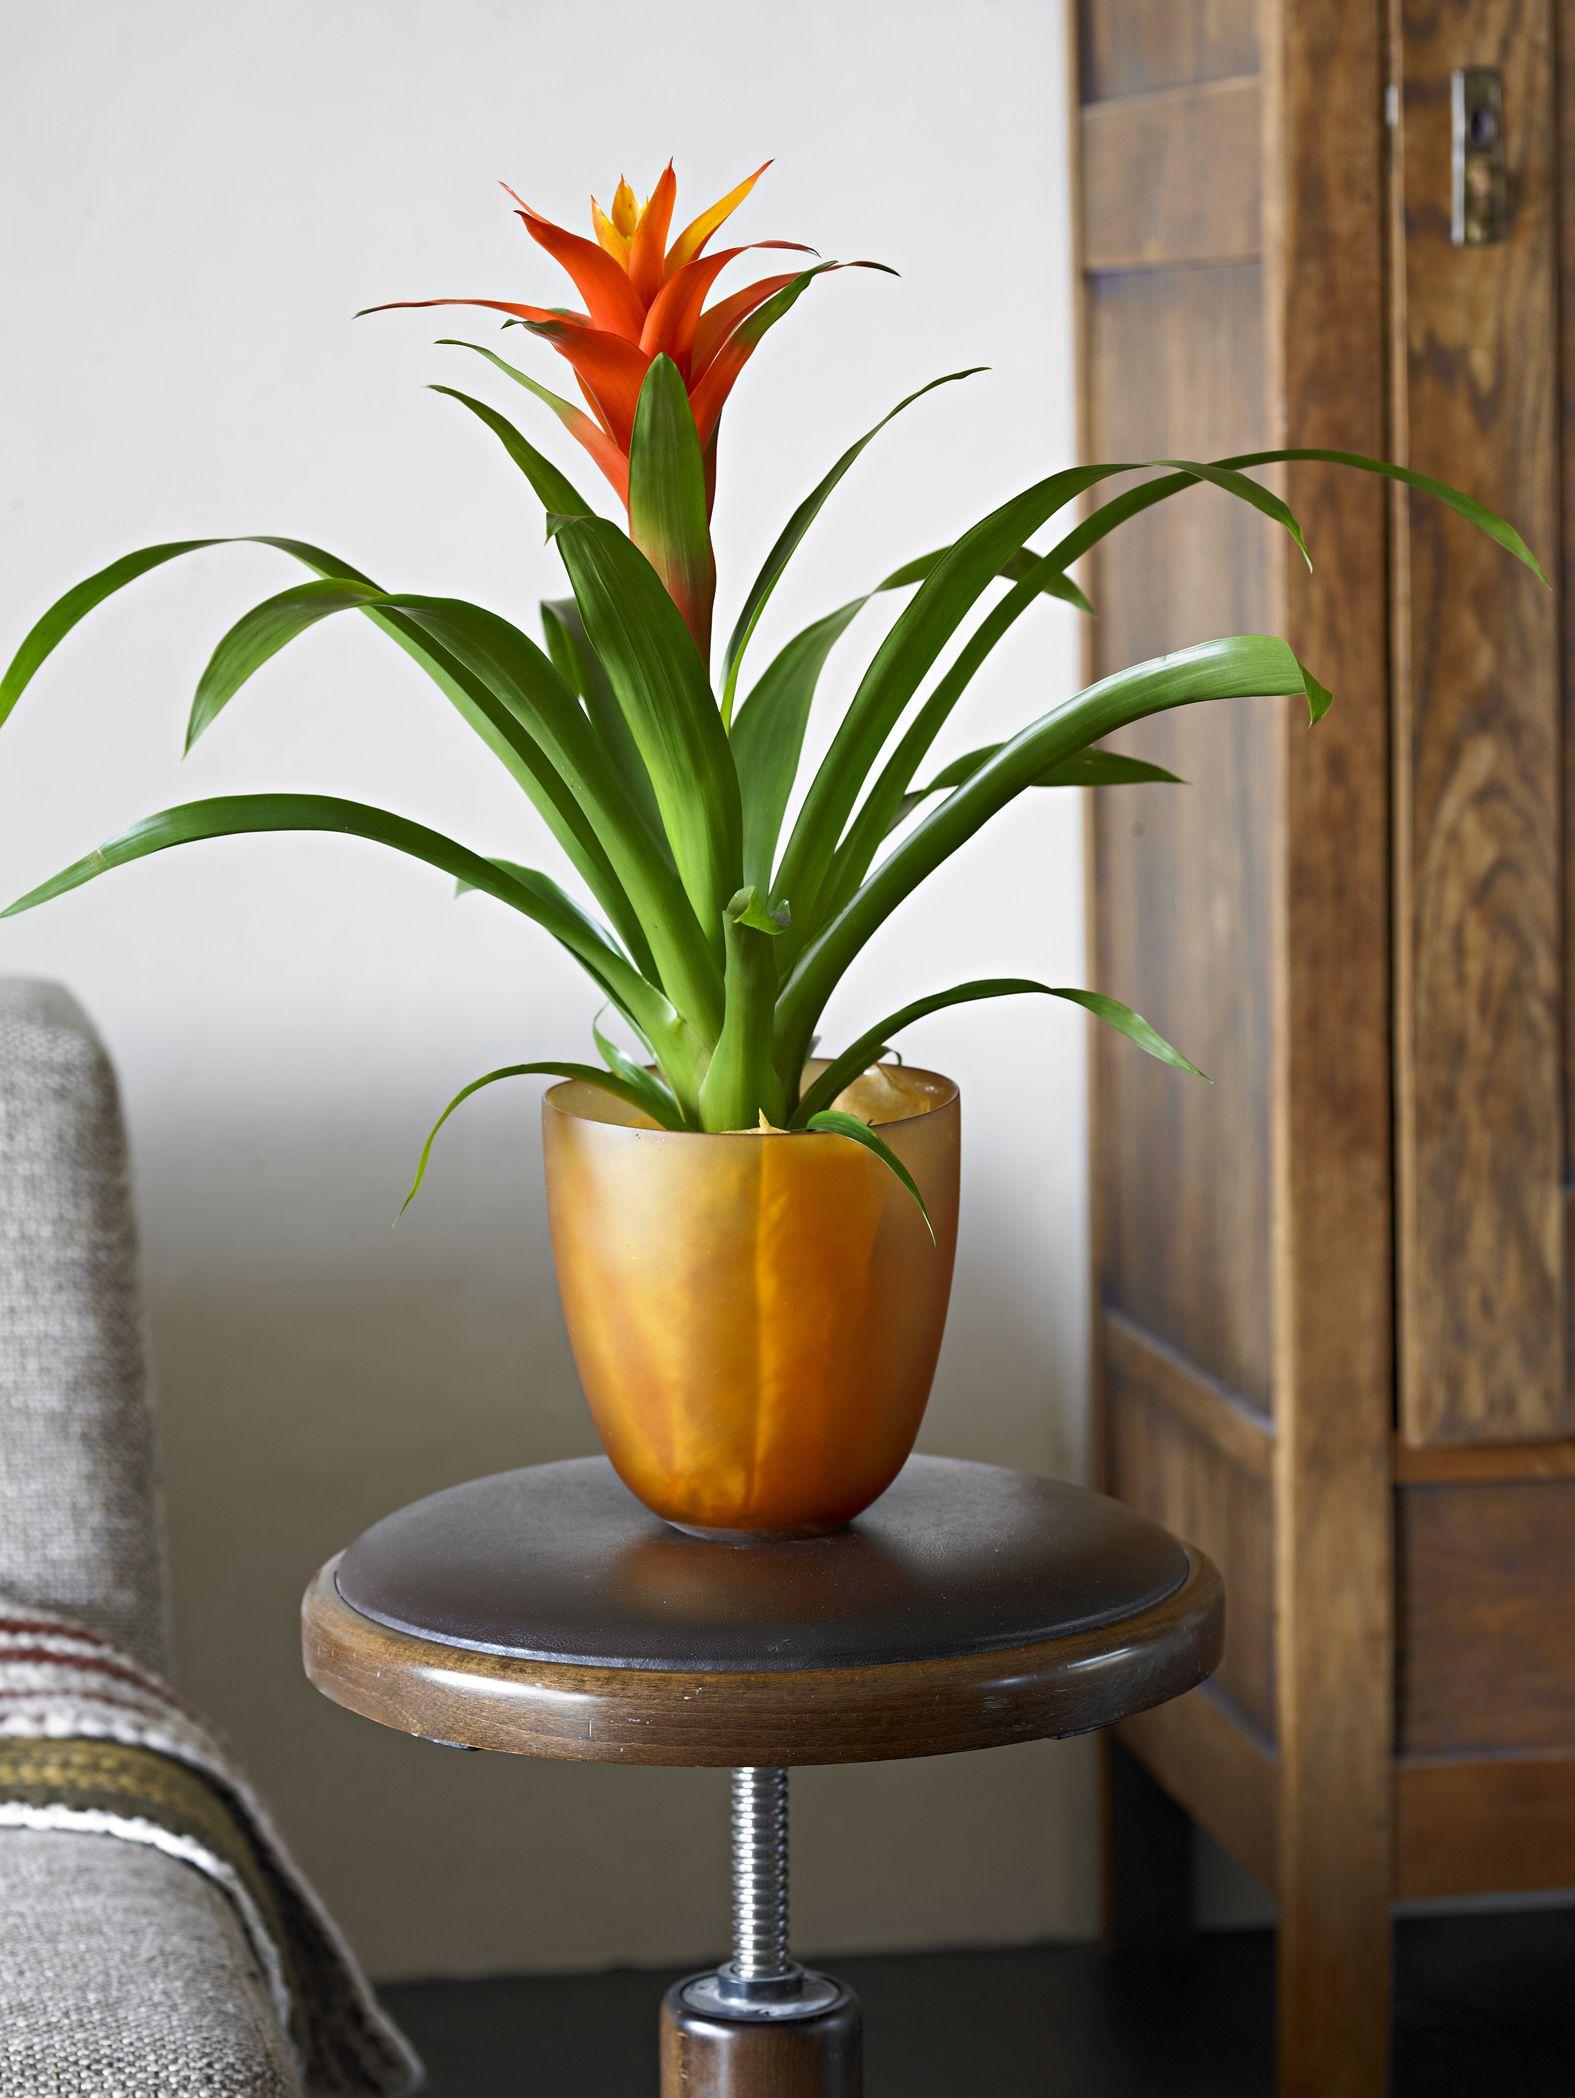 Bromelia - Bromelia, Classic Style - Pinterest - Houseplants And